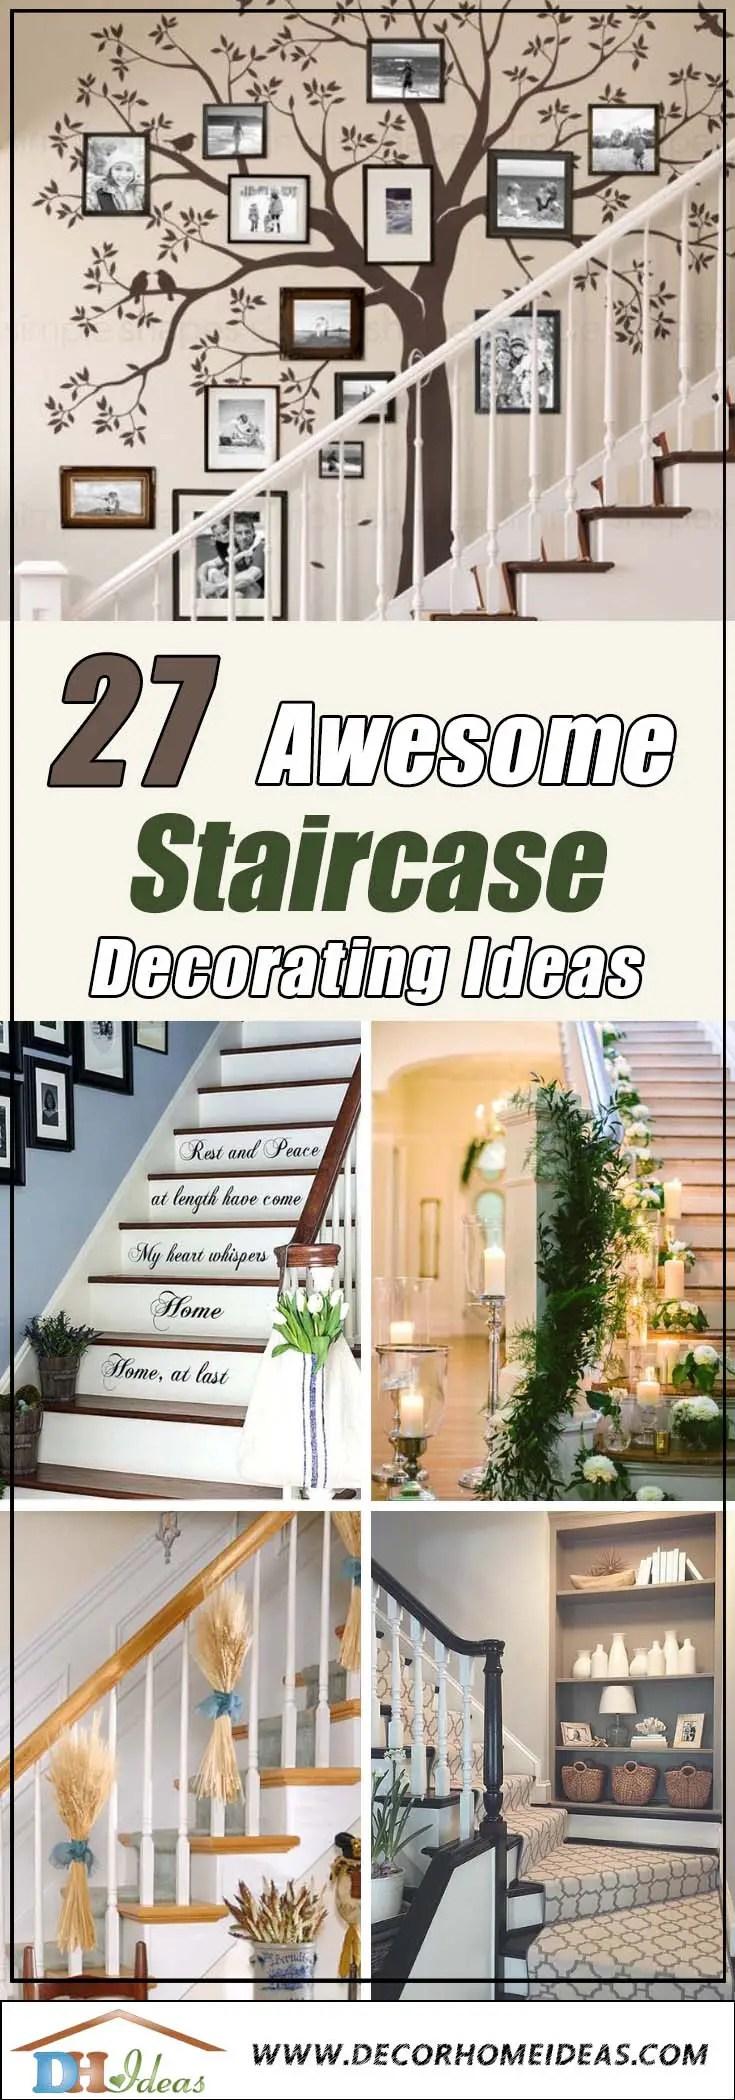 Sac Fjallraven Kanken Noir 32 Decor On Staircase Wall